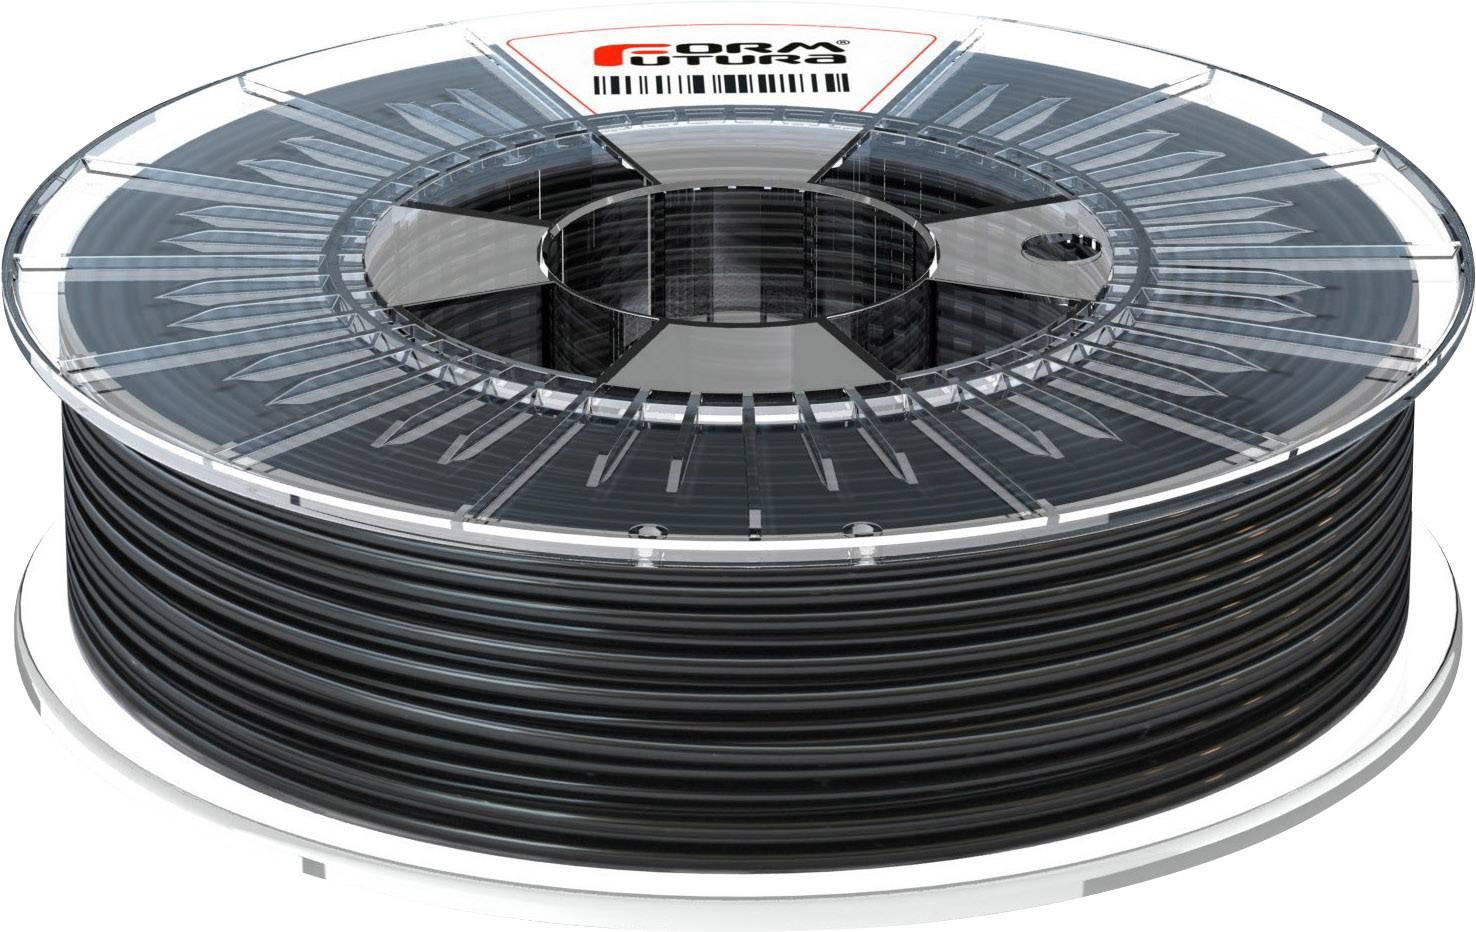 Vlákno pro 3D tiskárny Formfutura HDglass™, polyethylen (PET), 1.75 mm, 750 g, černá